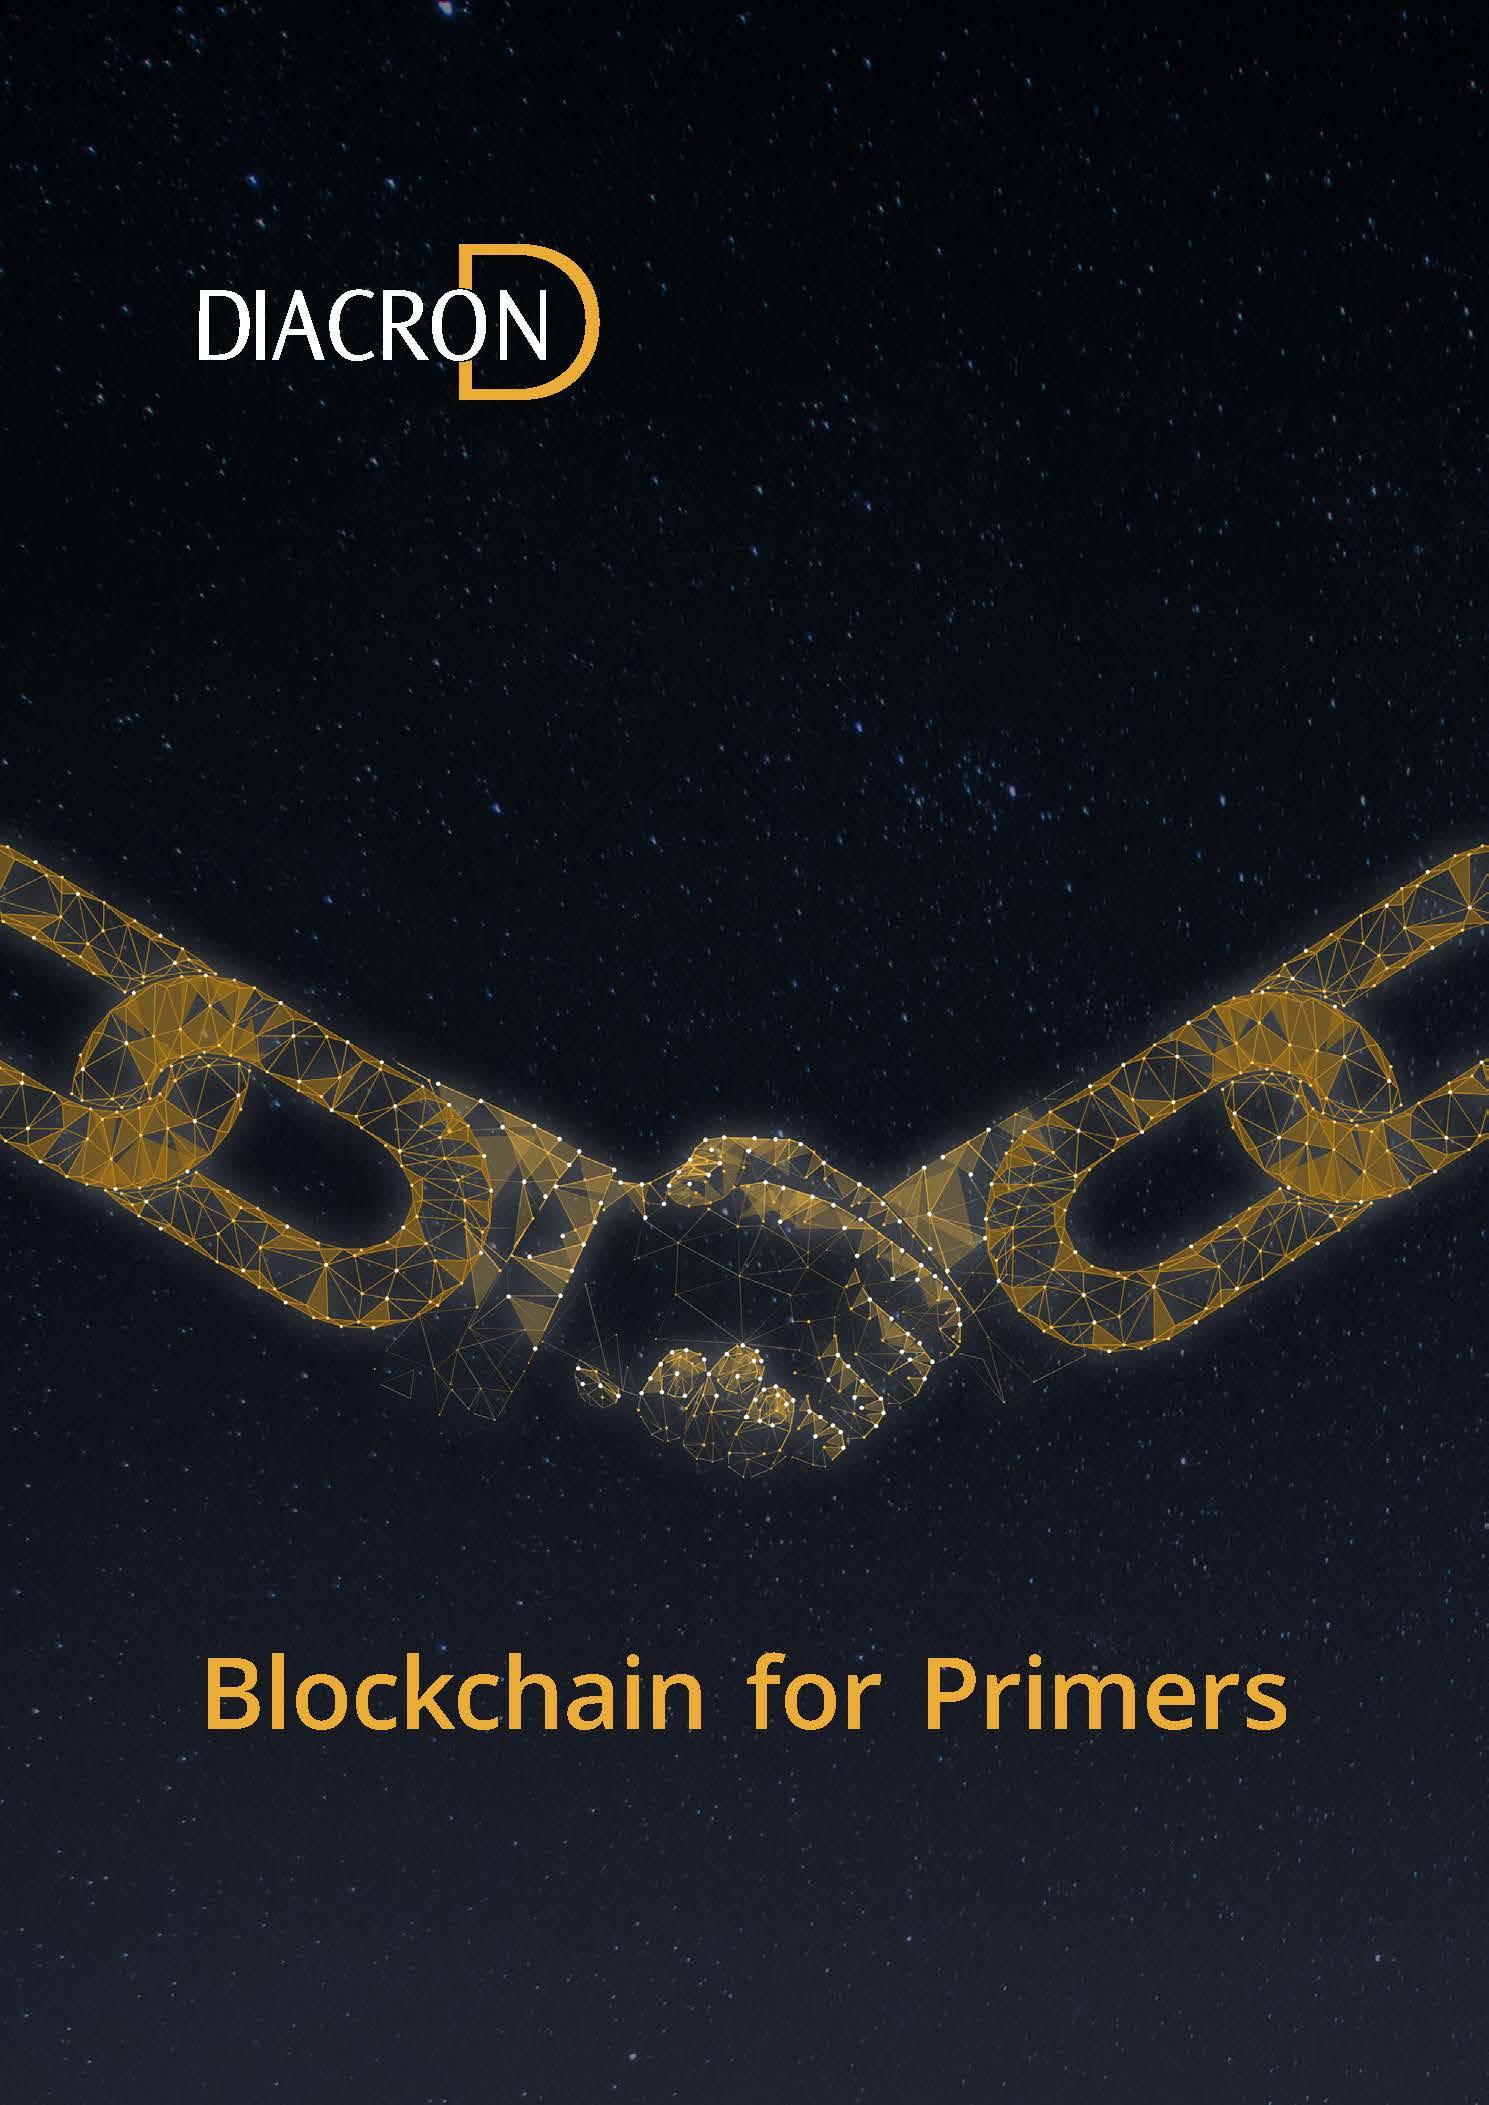 Blockchain for Primers